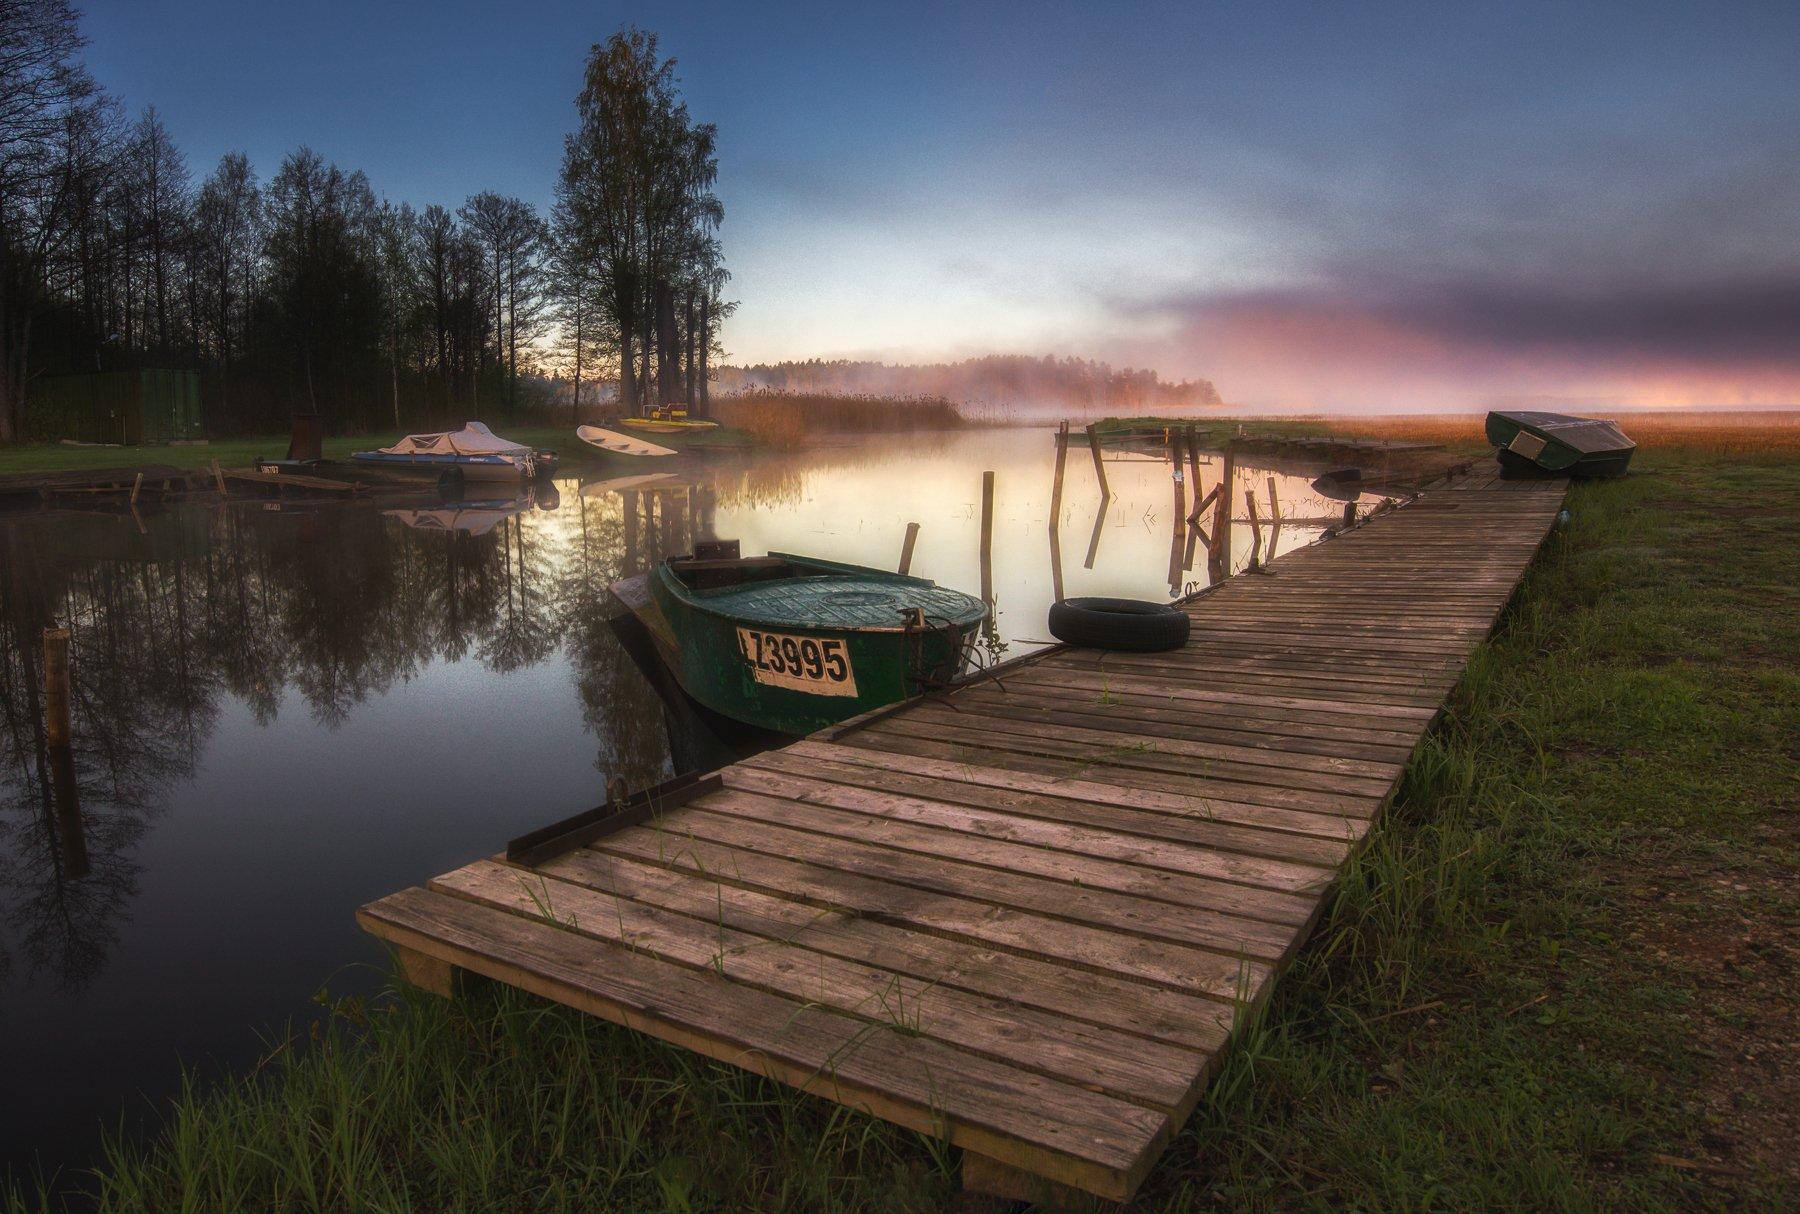 lake,sunrise,lighy,fog,boats,colours,озеро,рассвет,весна,пейзаж, Olegs Bucis